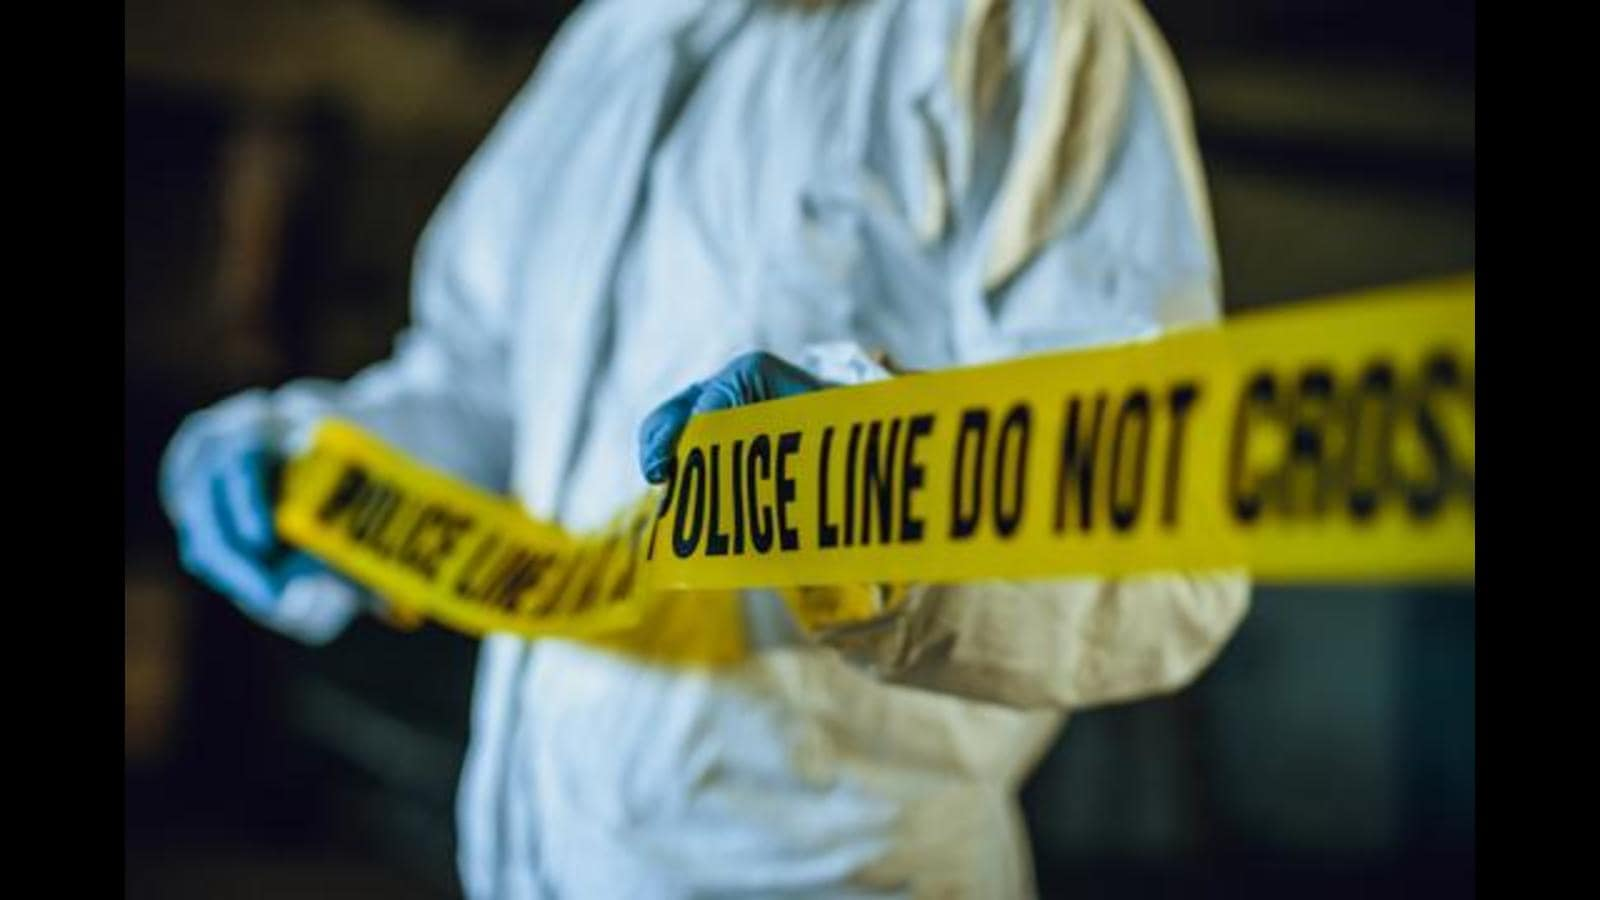 Men on 2 bikes open fire at Ayodhya's Durga Puja pandal; 1 killed, 2 injured